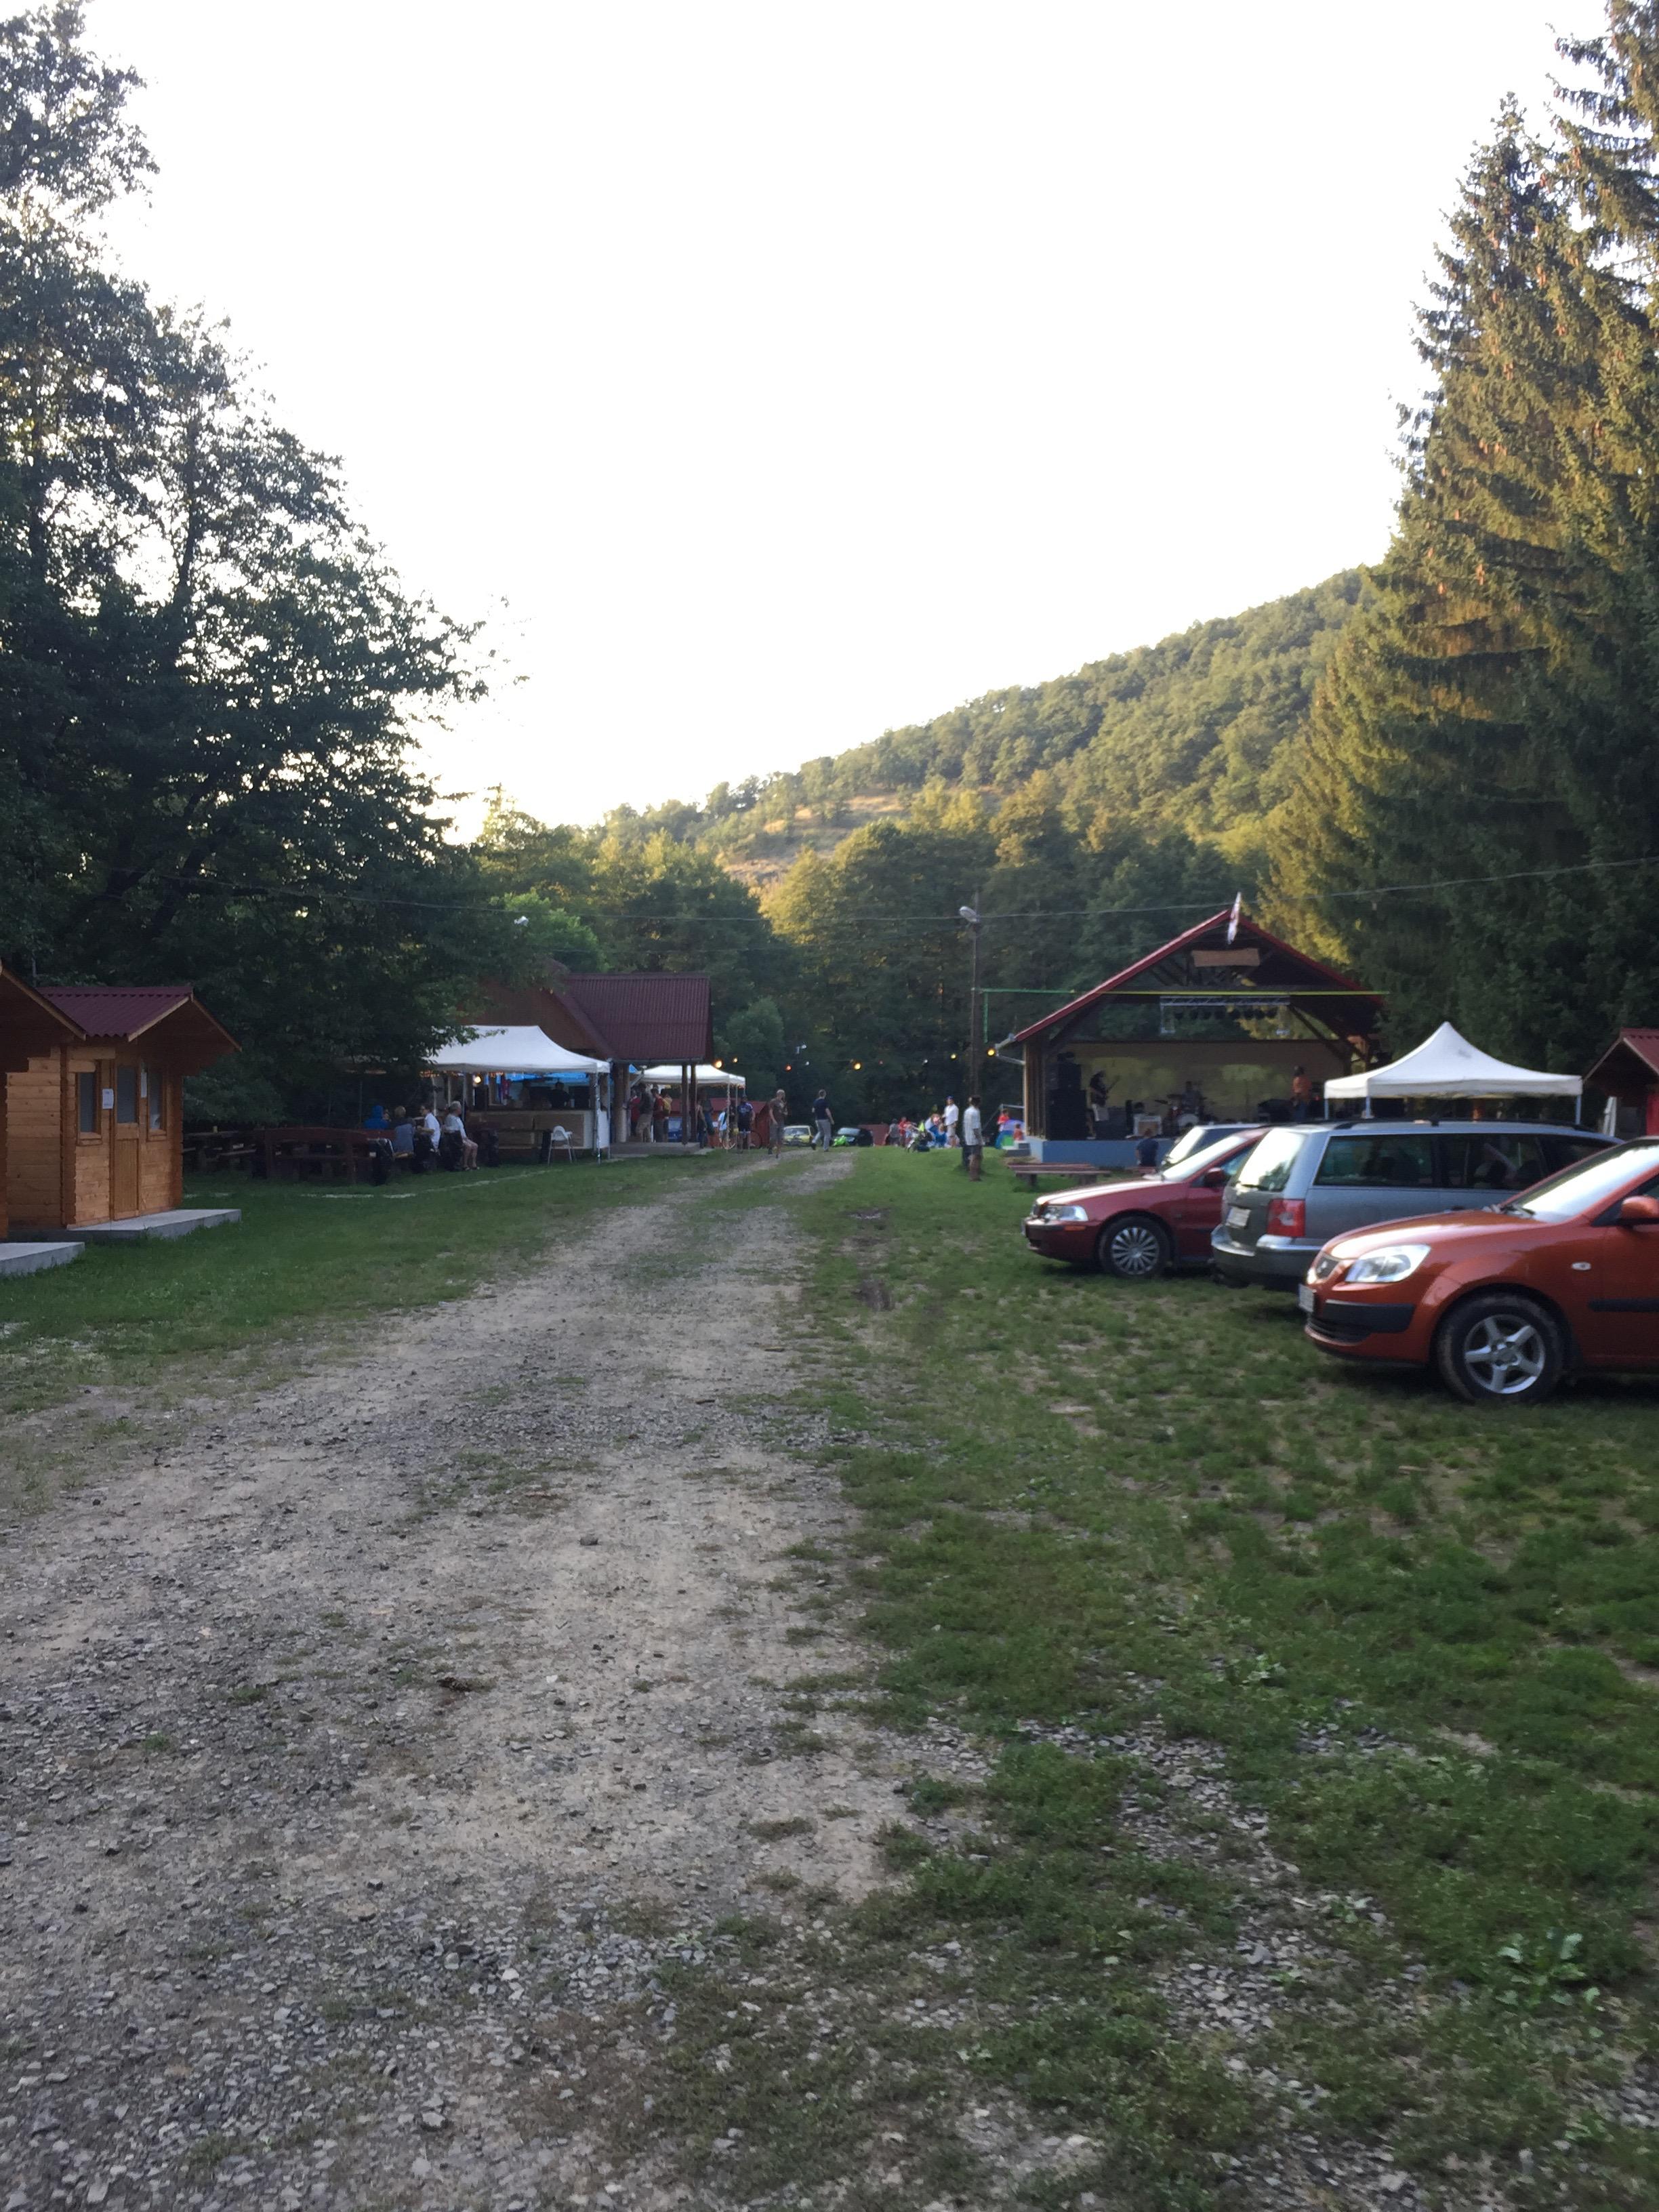 The festival.